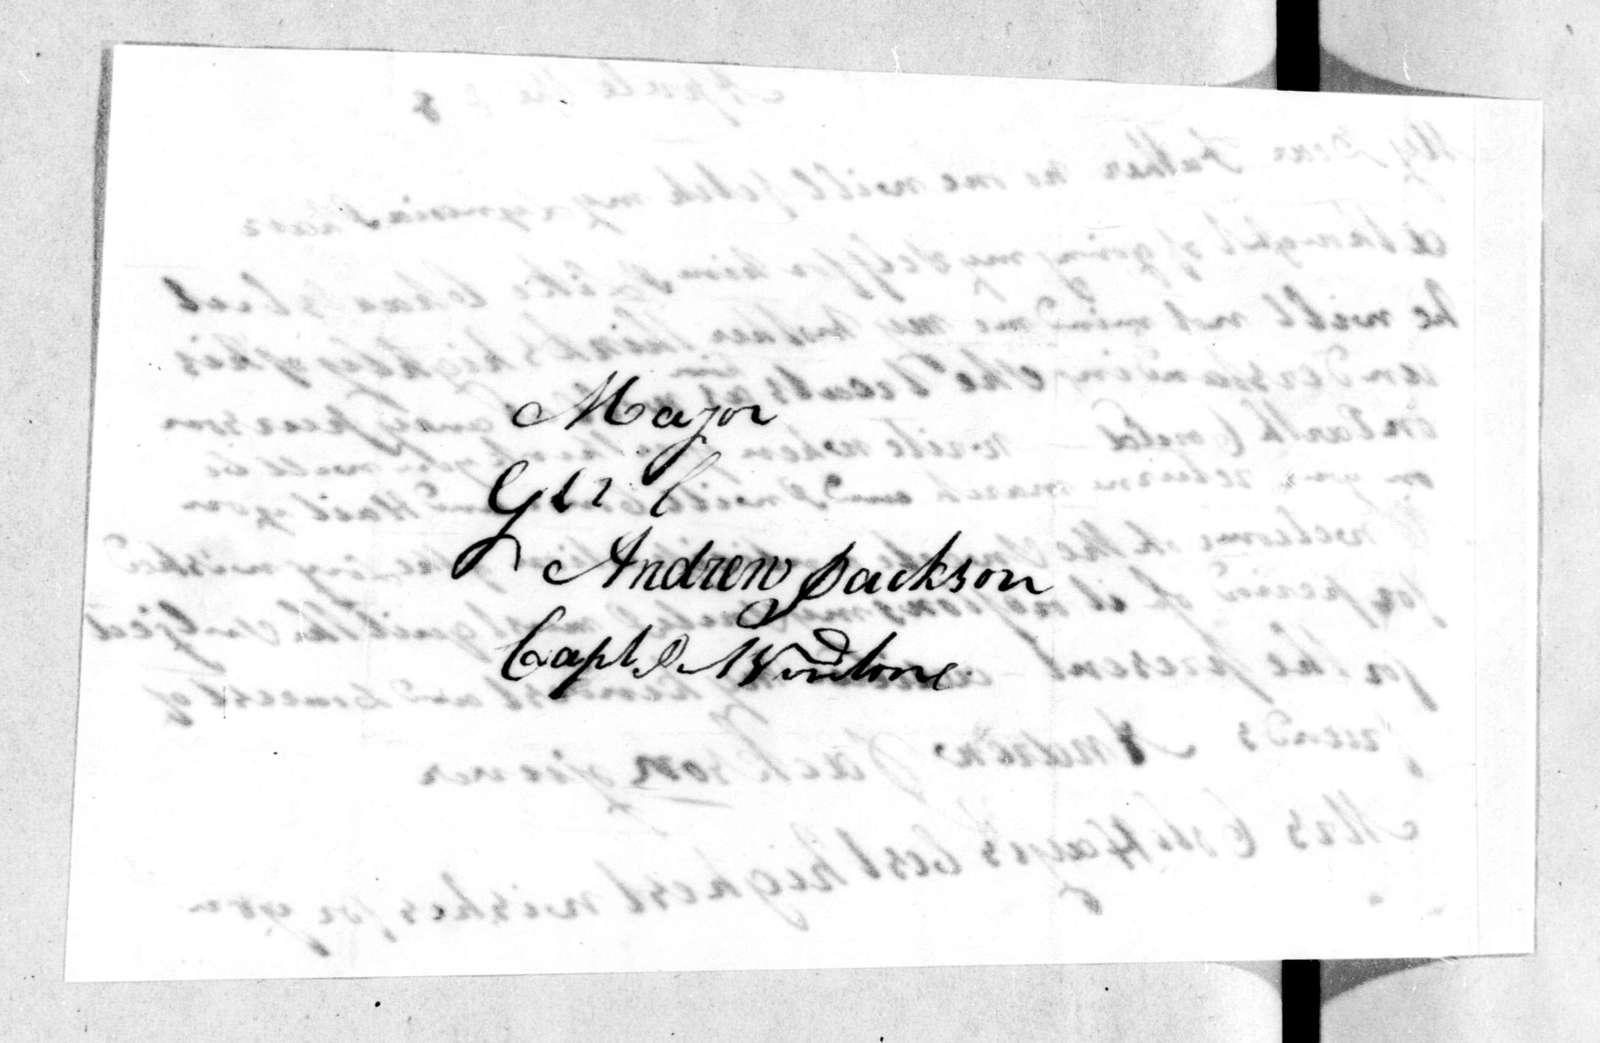 Andrew Jackson, Jr. to Andrew Jackson, April 7, 1814